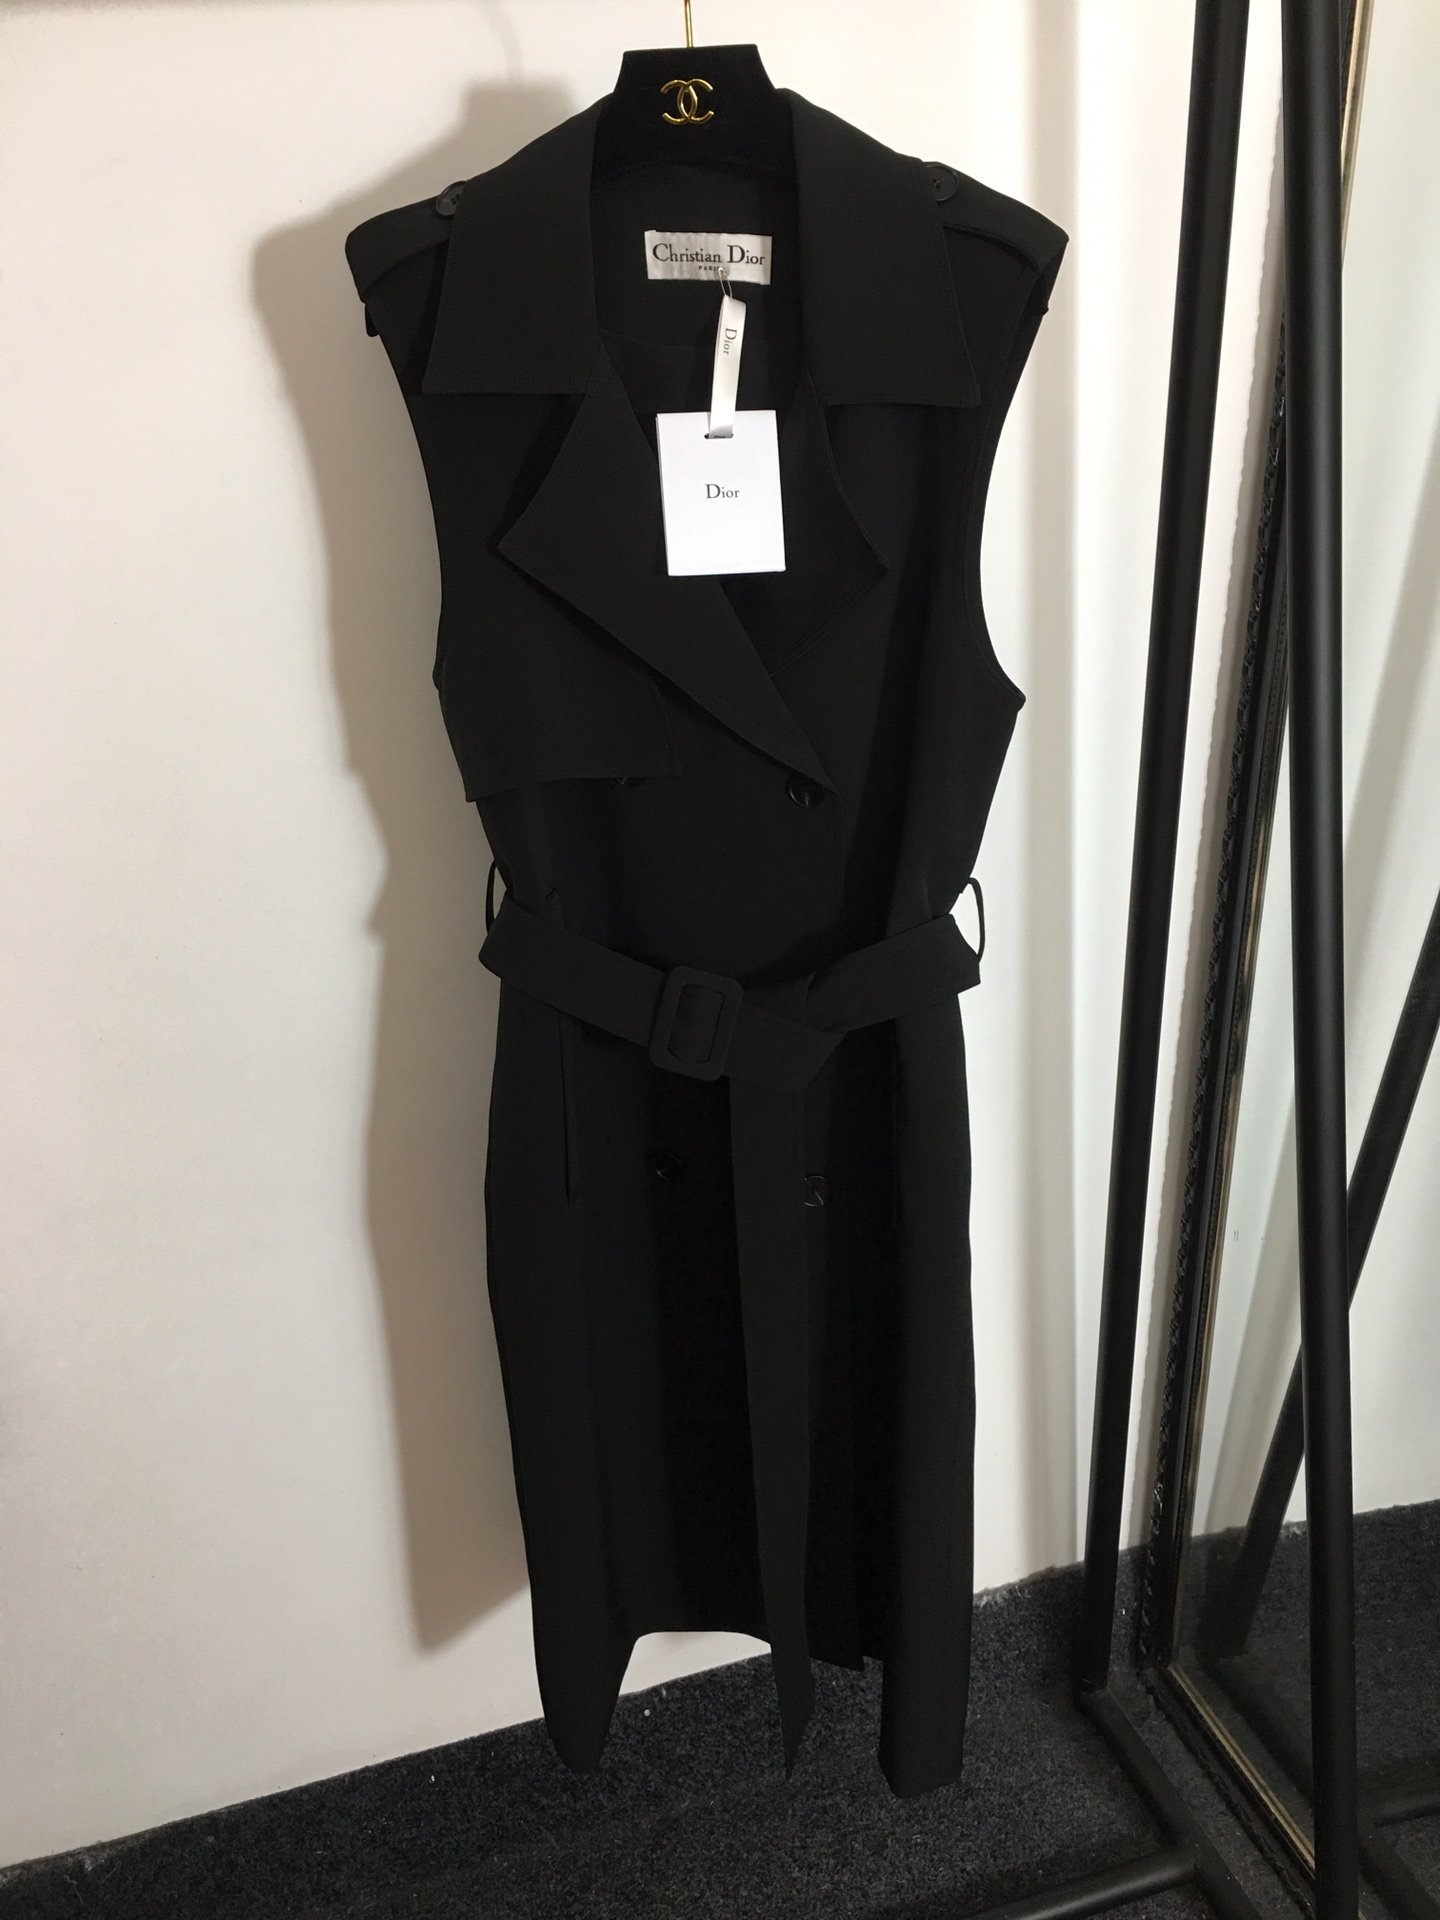 Dior新款时尚双排扣系带收腰西装领